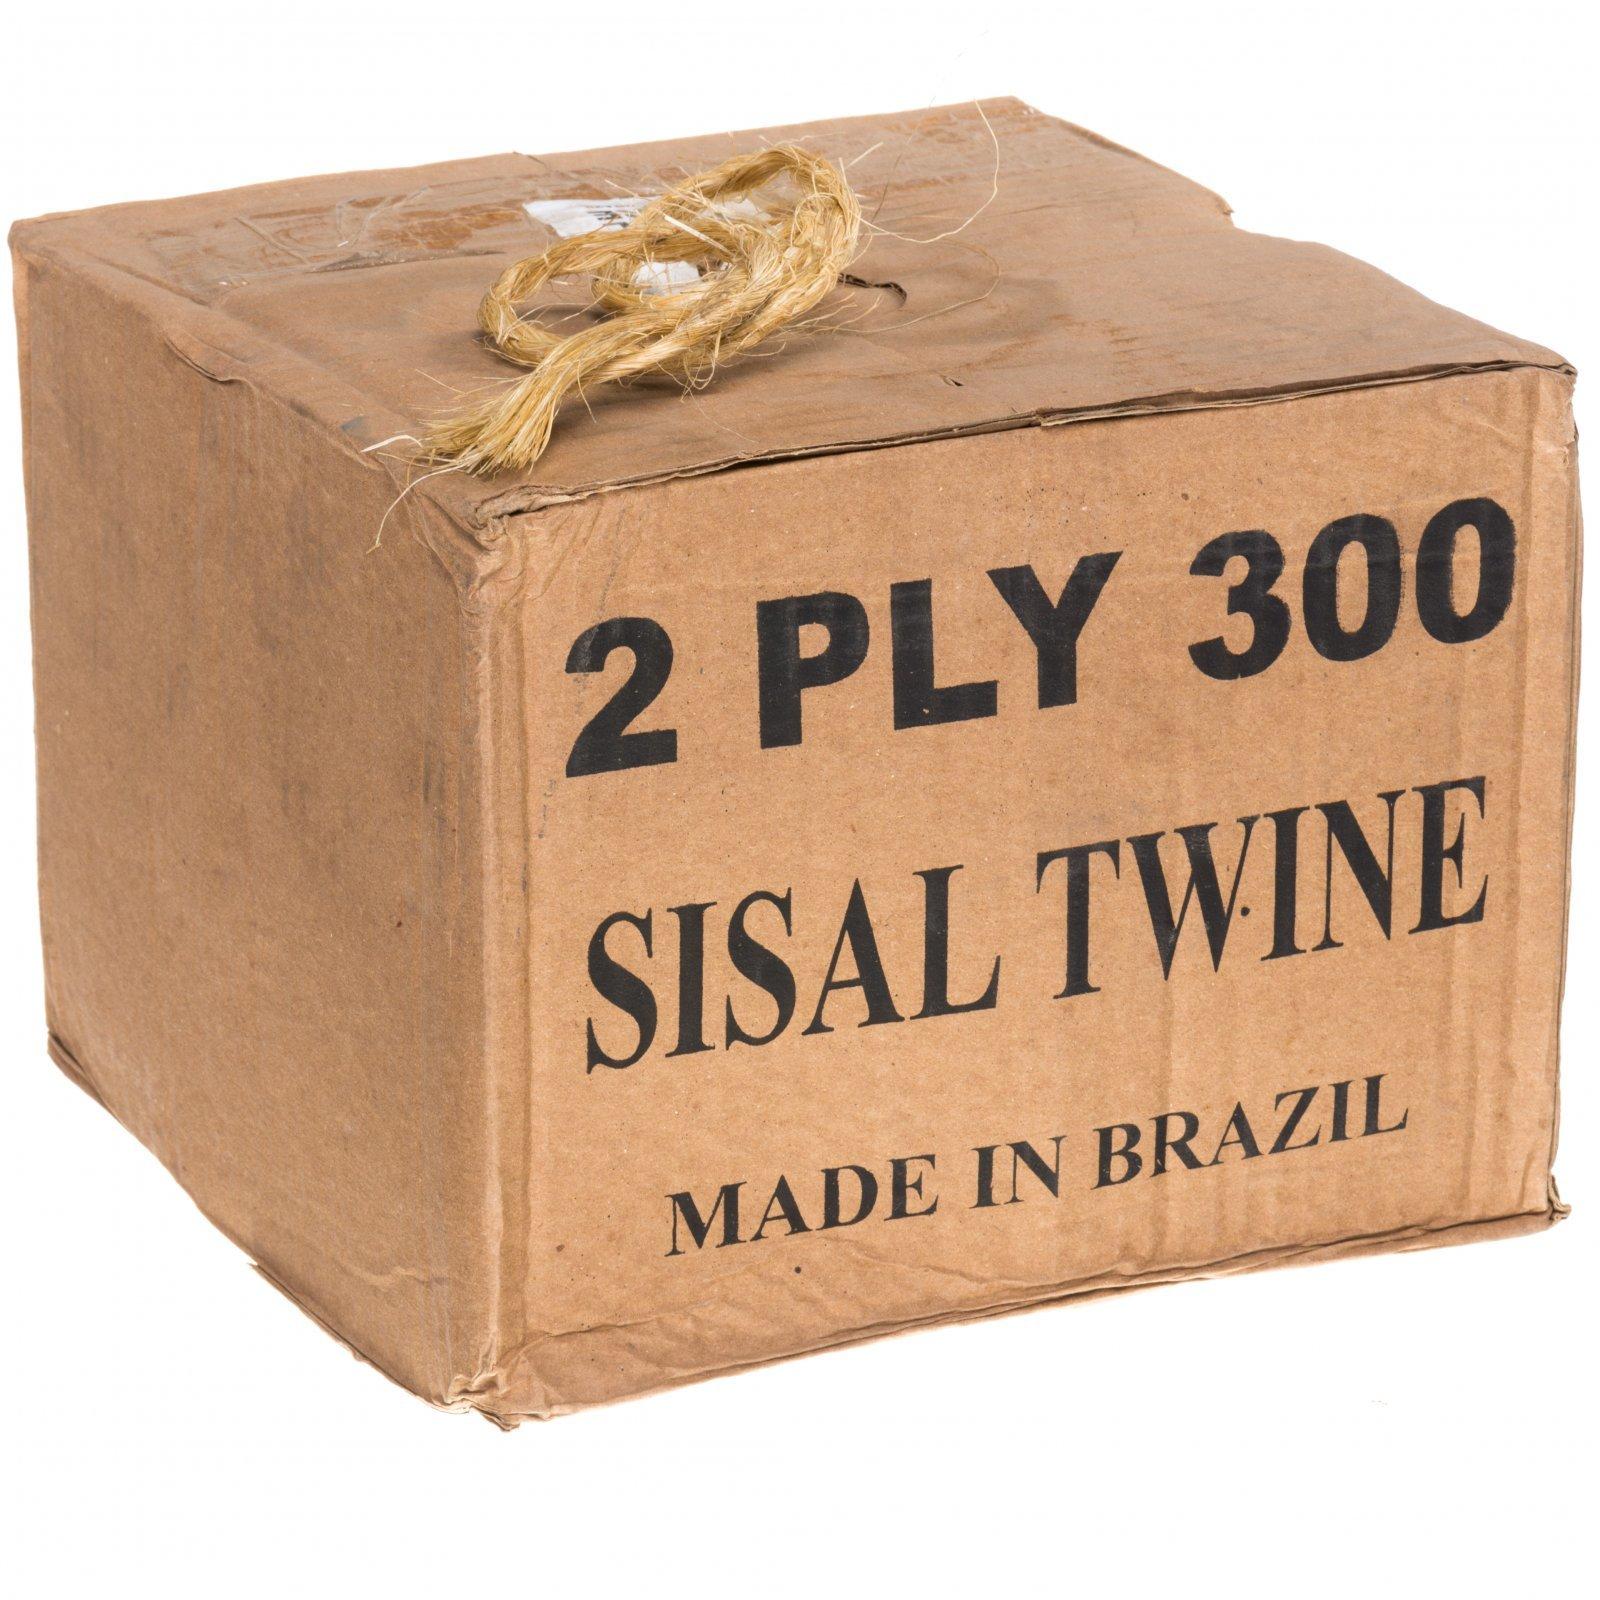 Sisal Twine